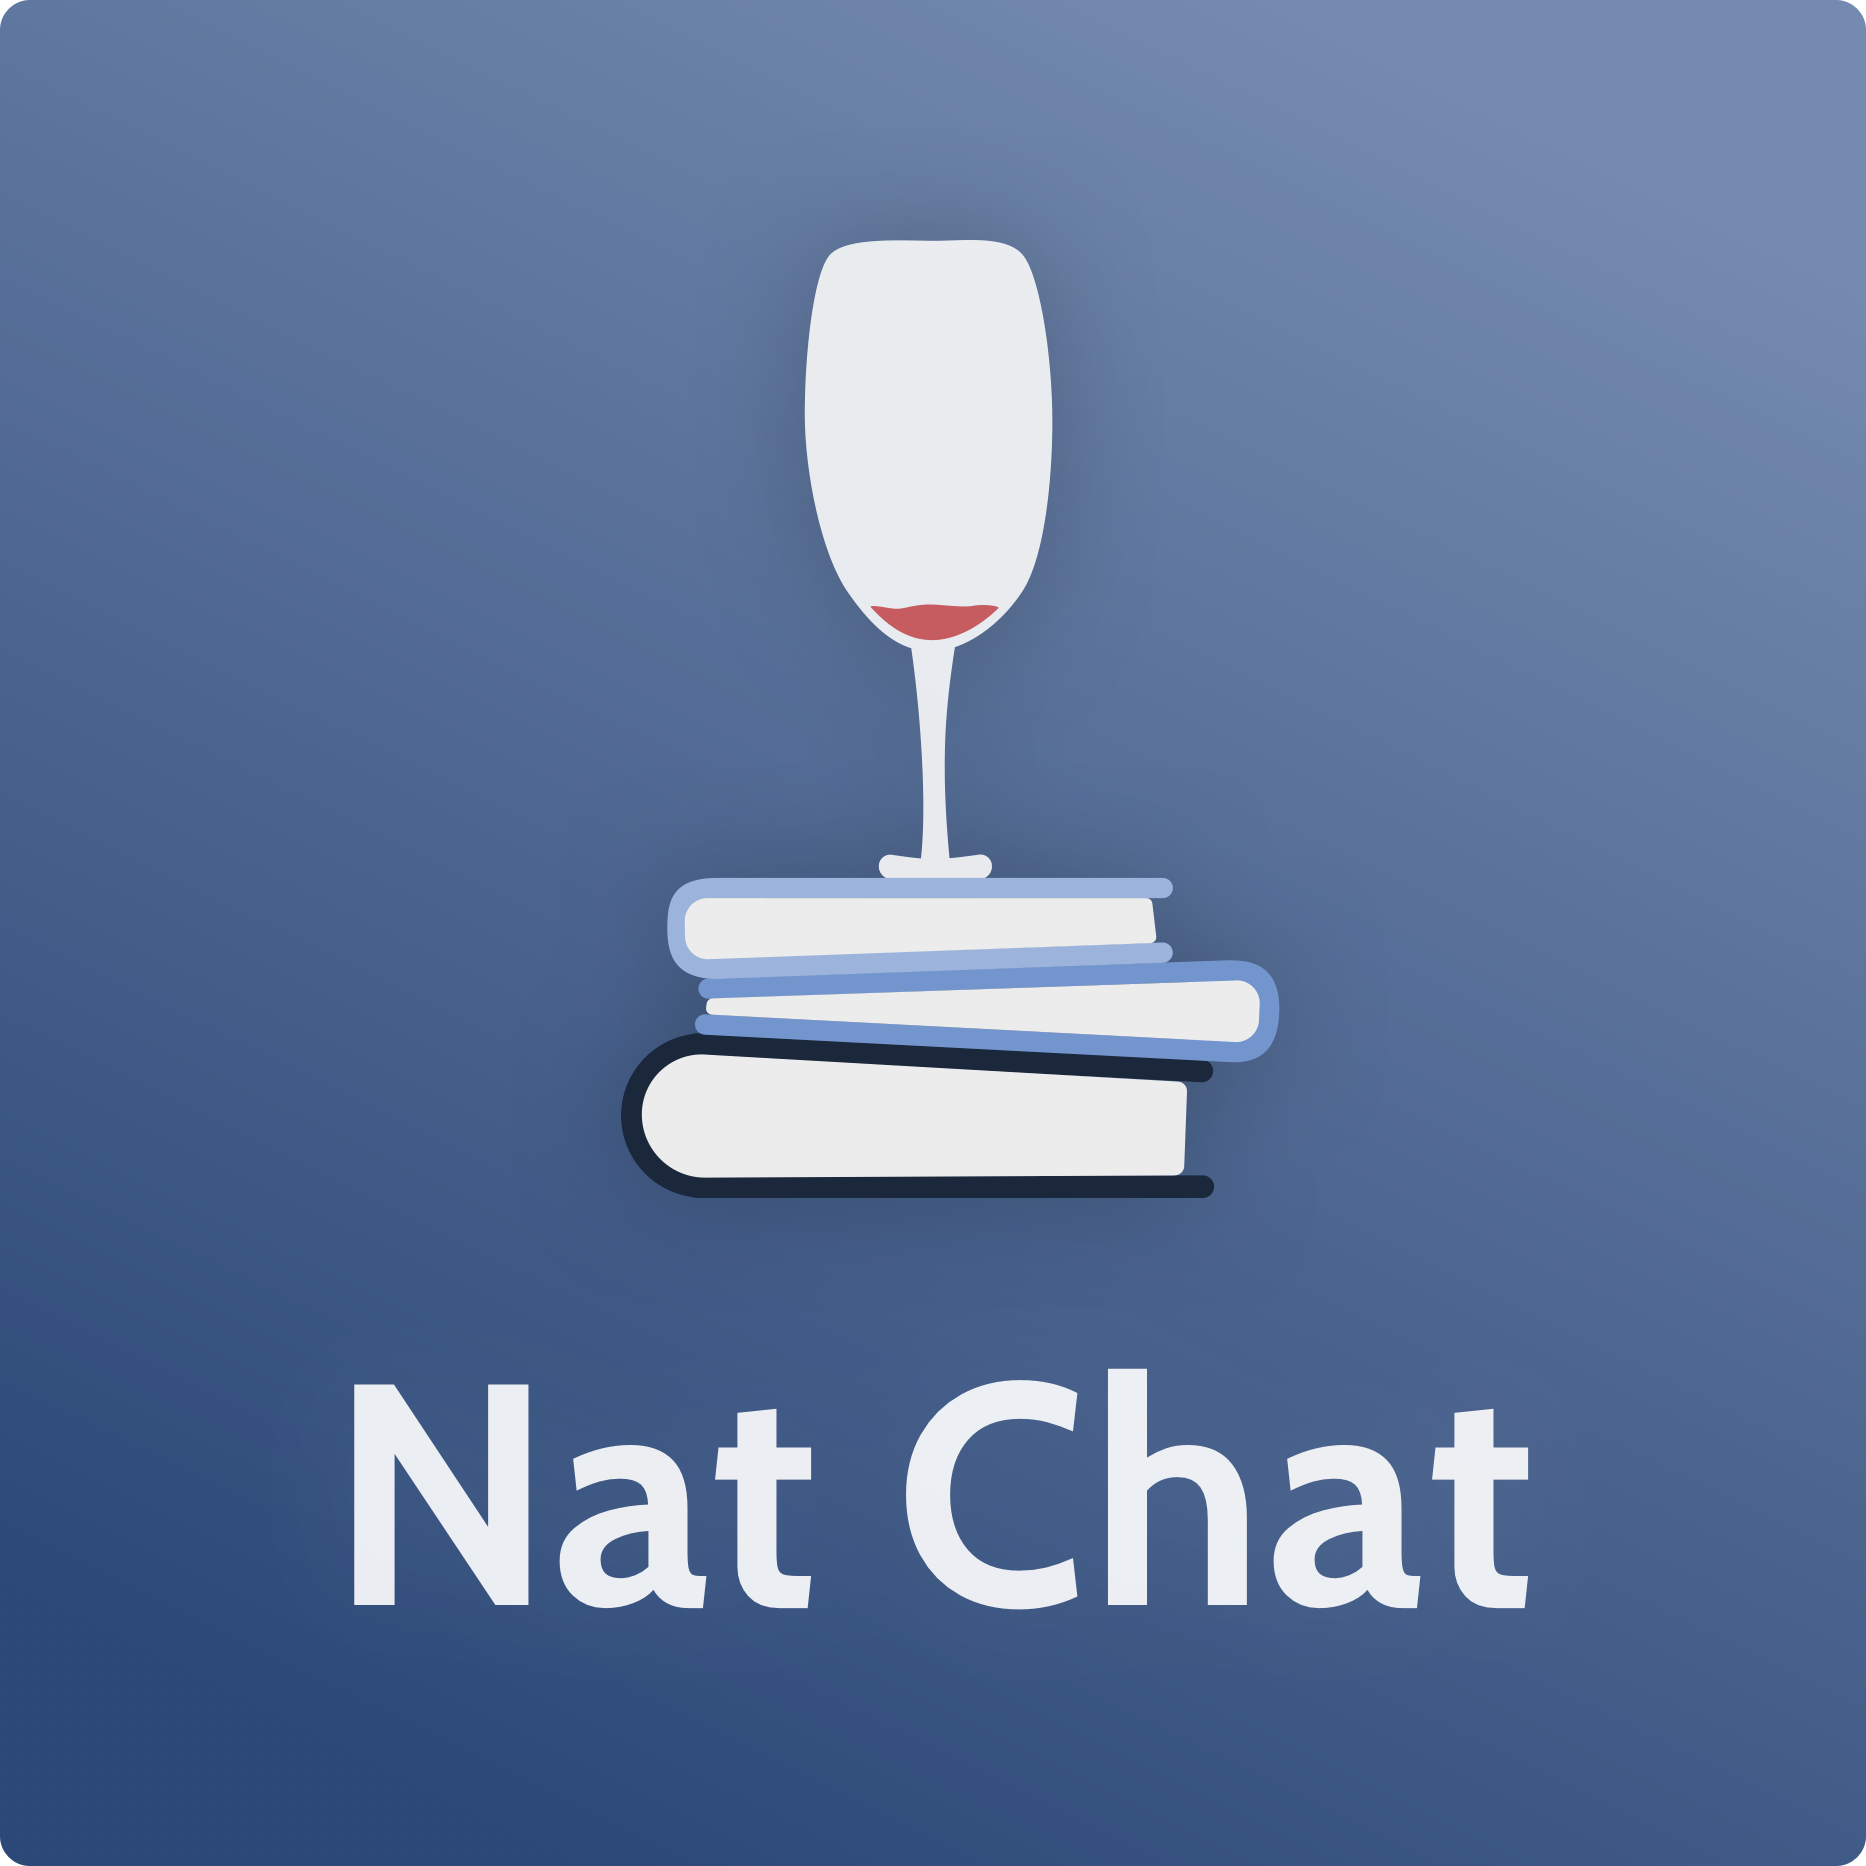 Nat Chat show art